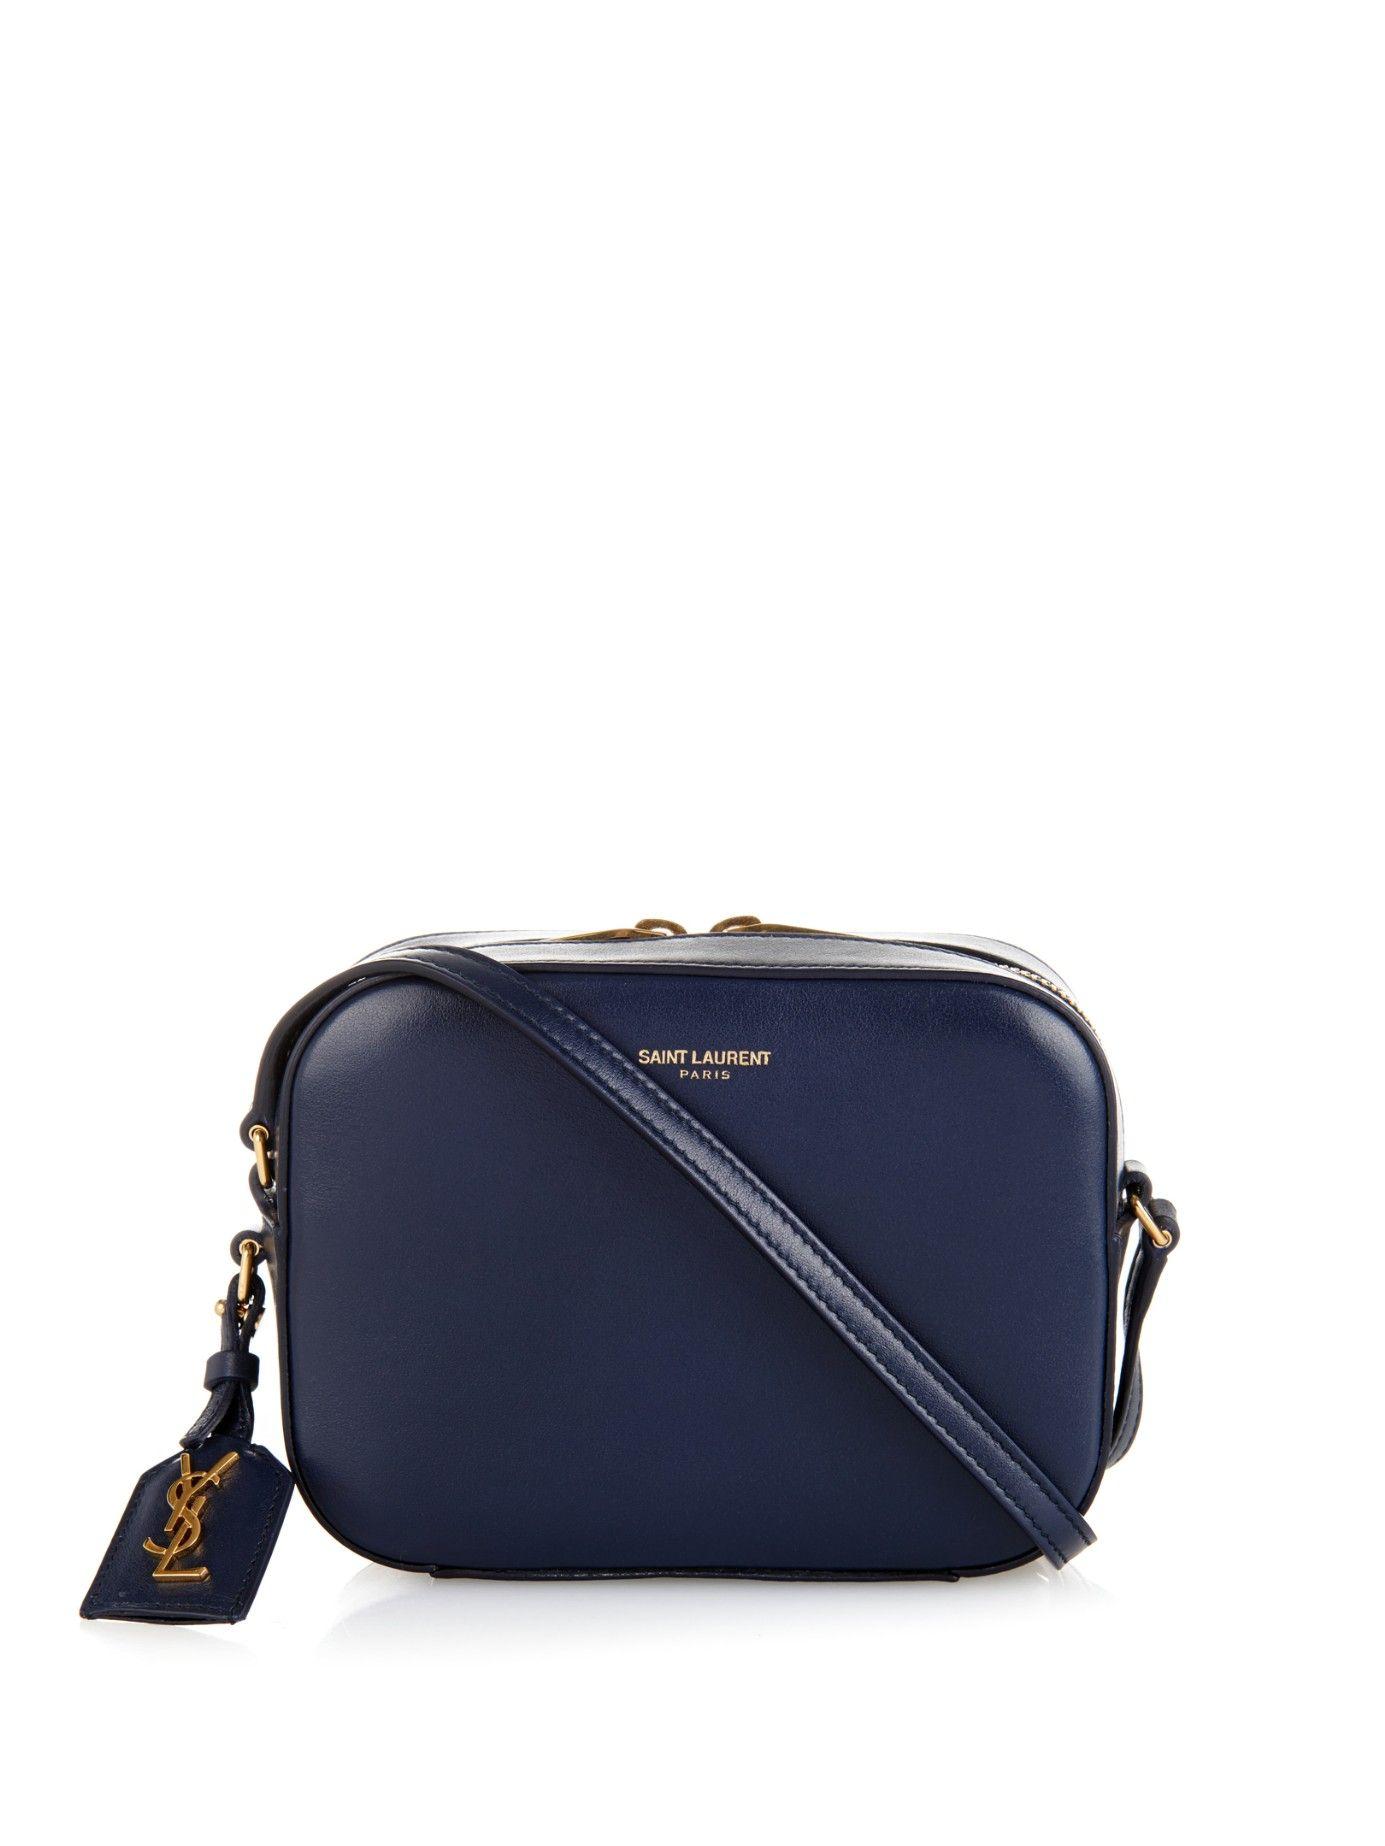 Small Leather Camera Bag Saint Laurent Matchesfashion Com Uk